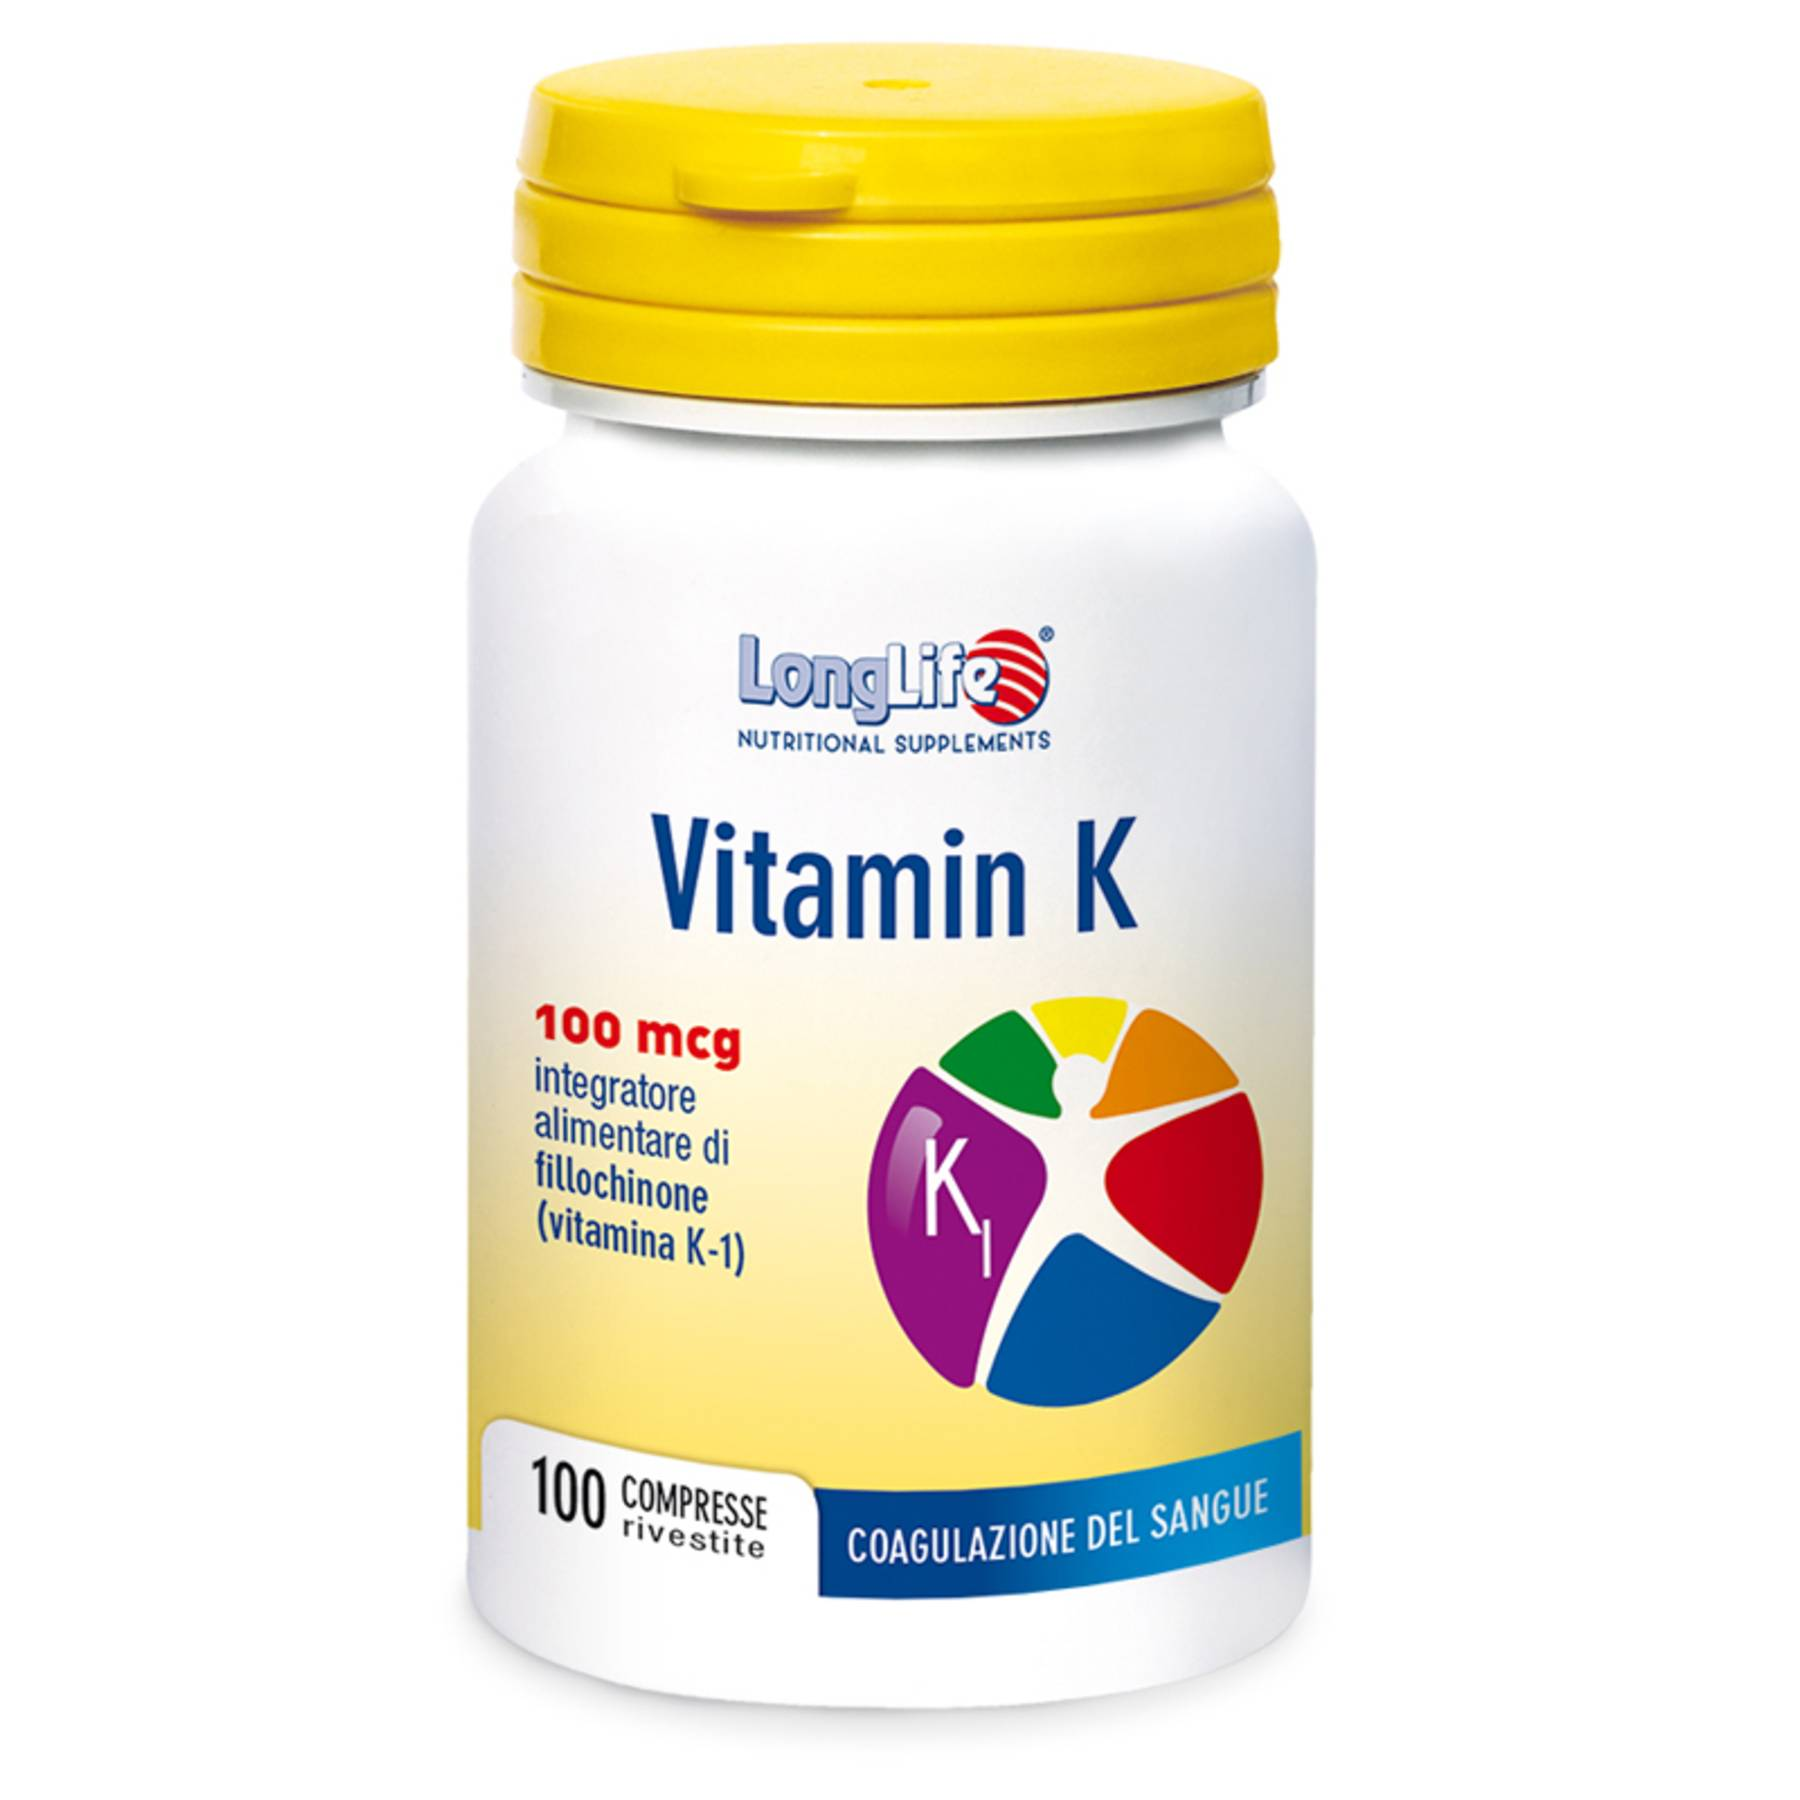 Phoenix Longlife vitamin k 100mcg 100 compresse